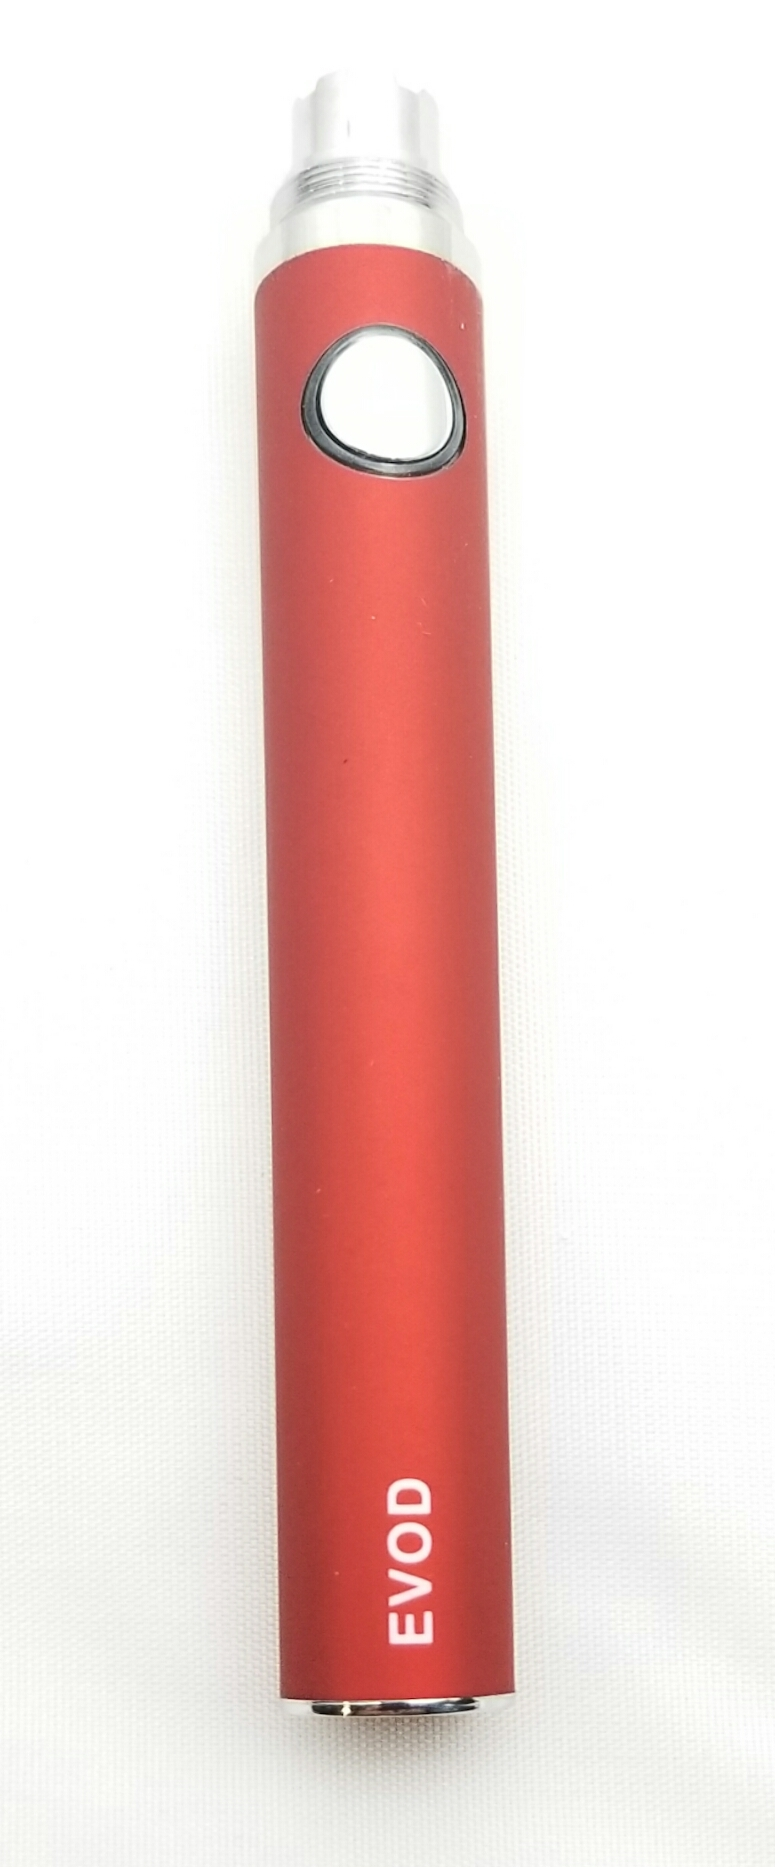 Strawberry-1,000mg cartridge